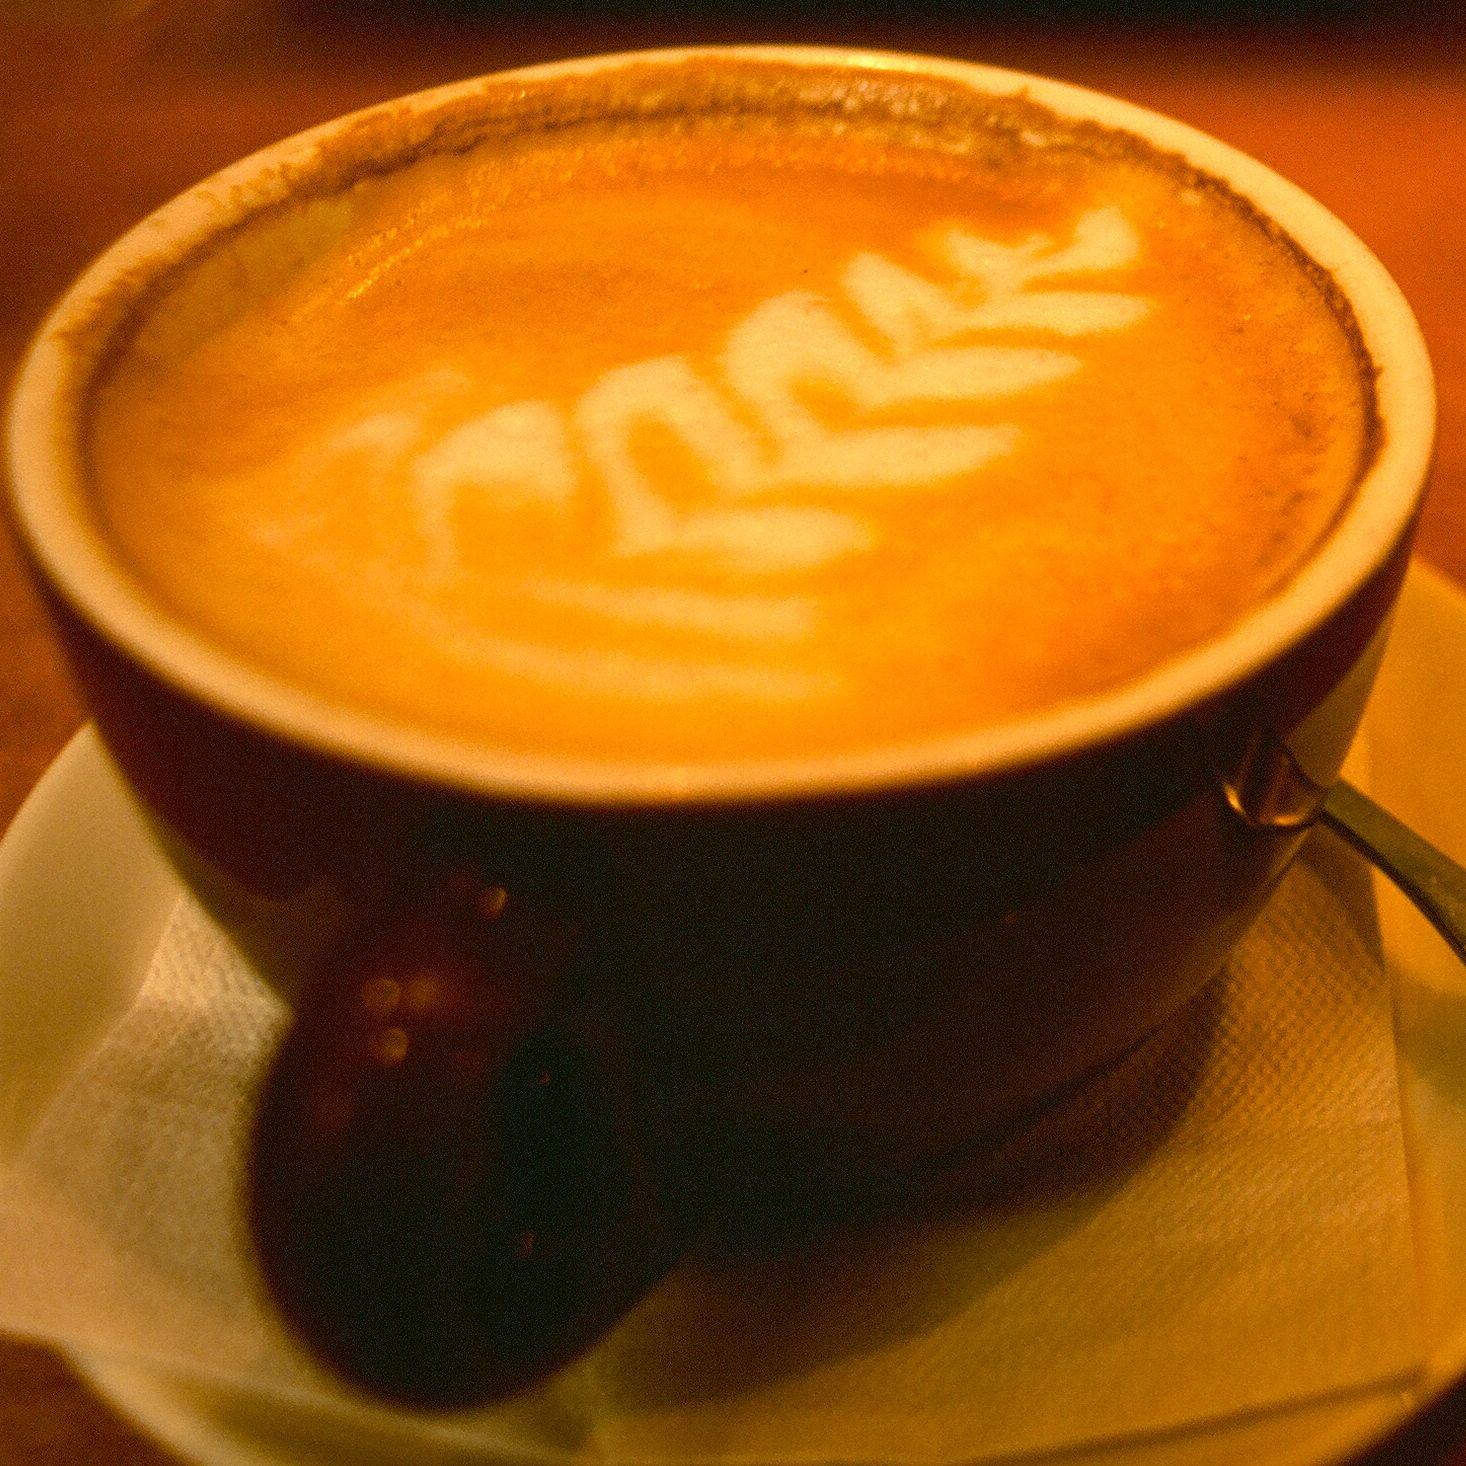 Waypoint 3 - Maya's Coffee Recs   Hosted by Vicki Ballante